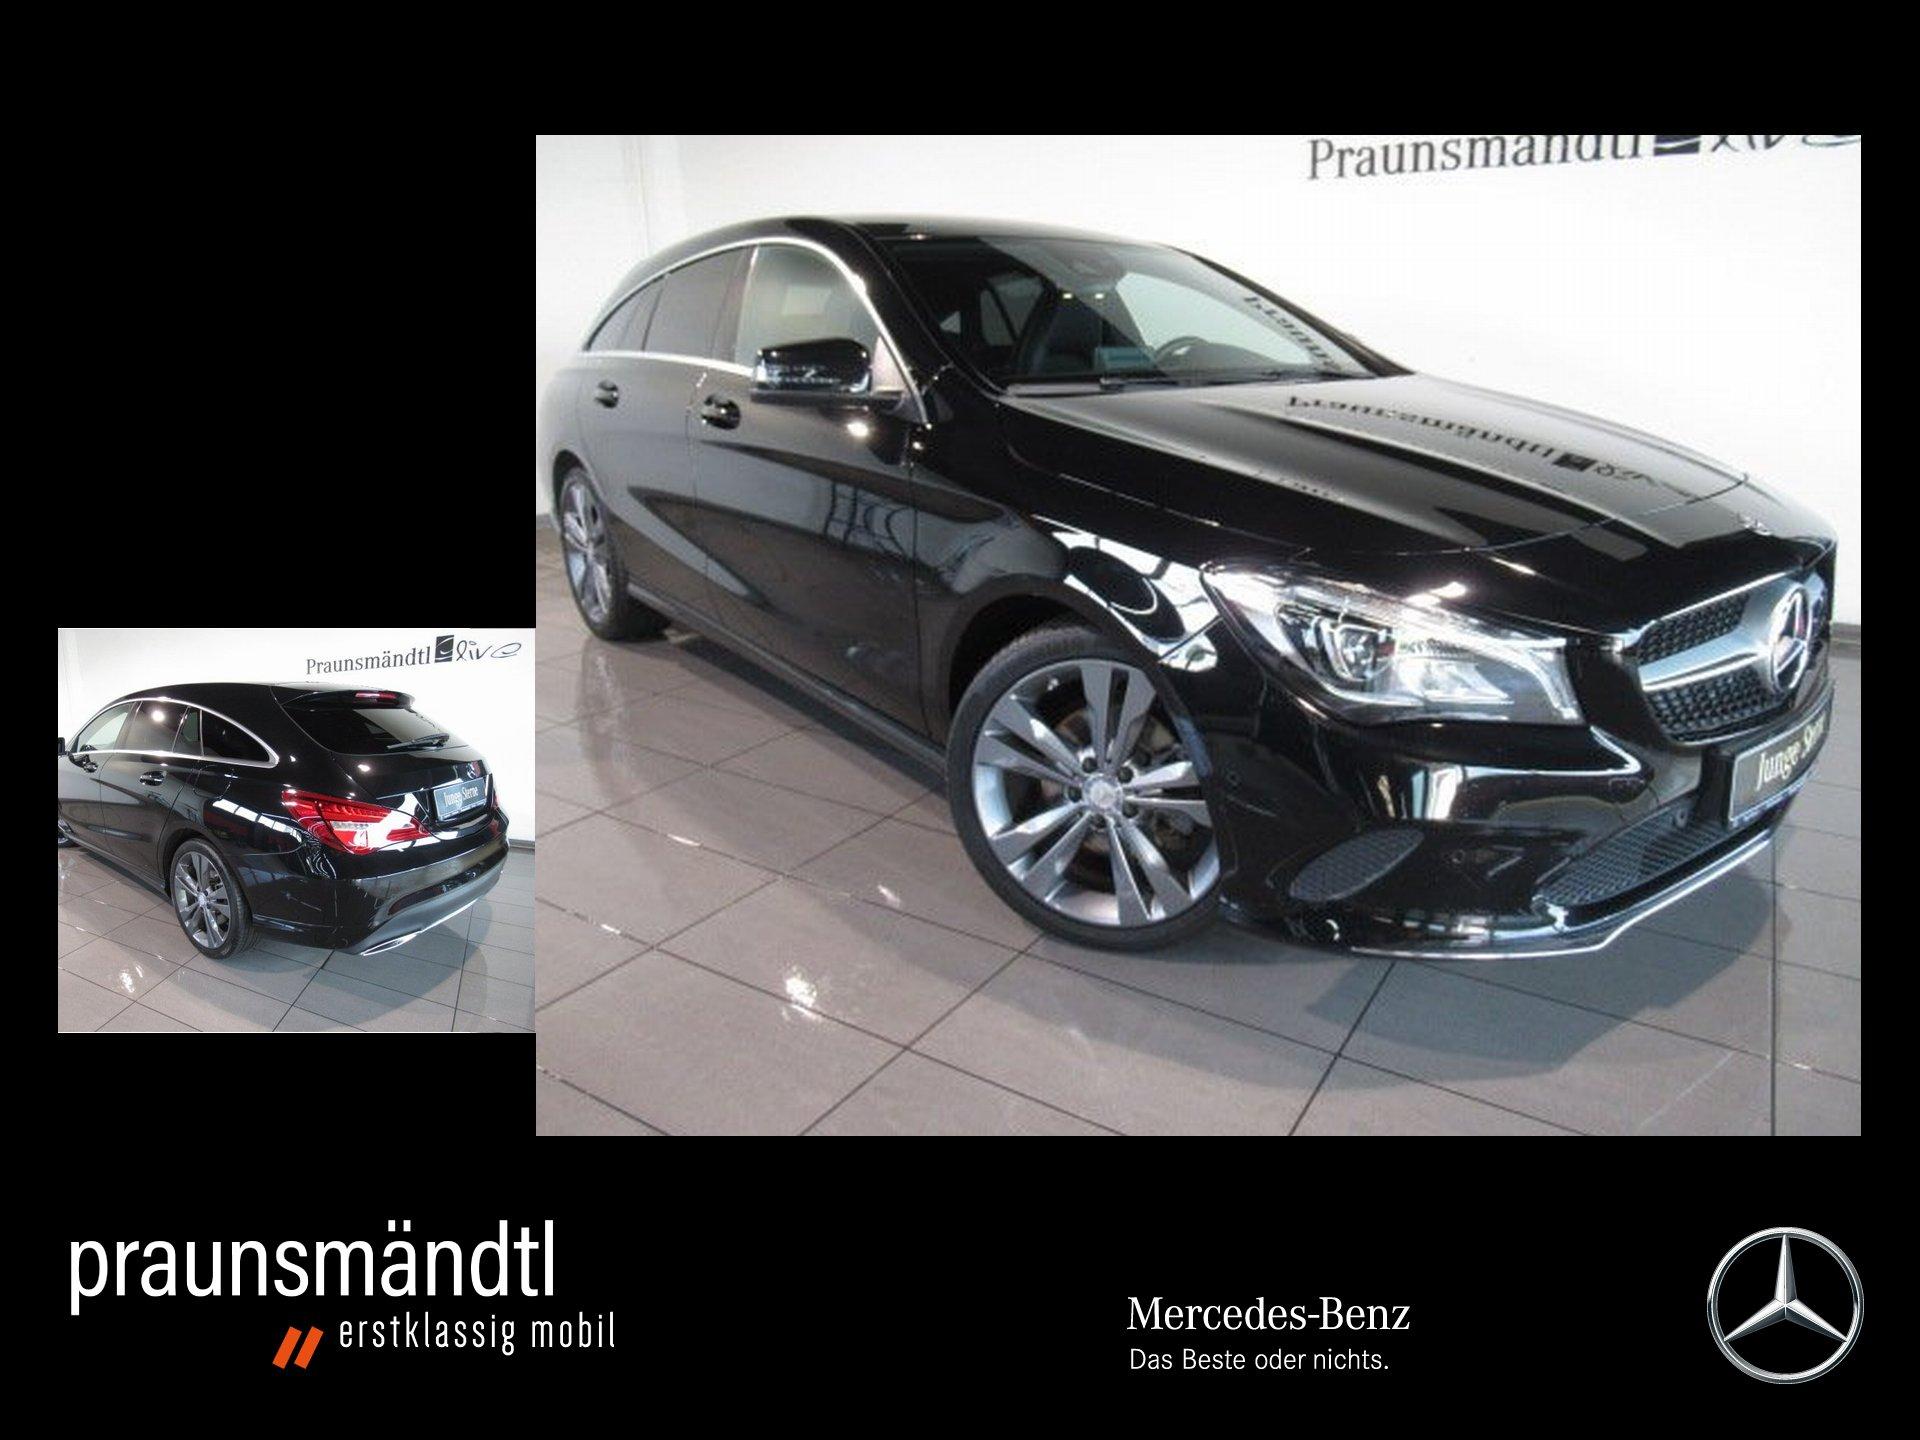 Mercedes-Benz CLA 200 d 4M SB Urban 7AG/LED/AHK/Navi/Kamera/18, Jahr 2017, Diesel